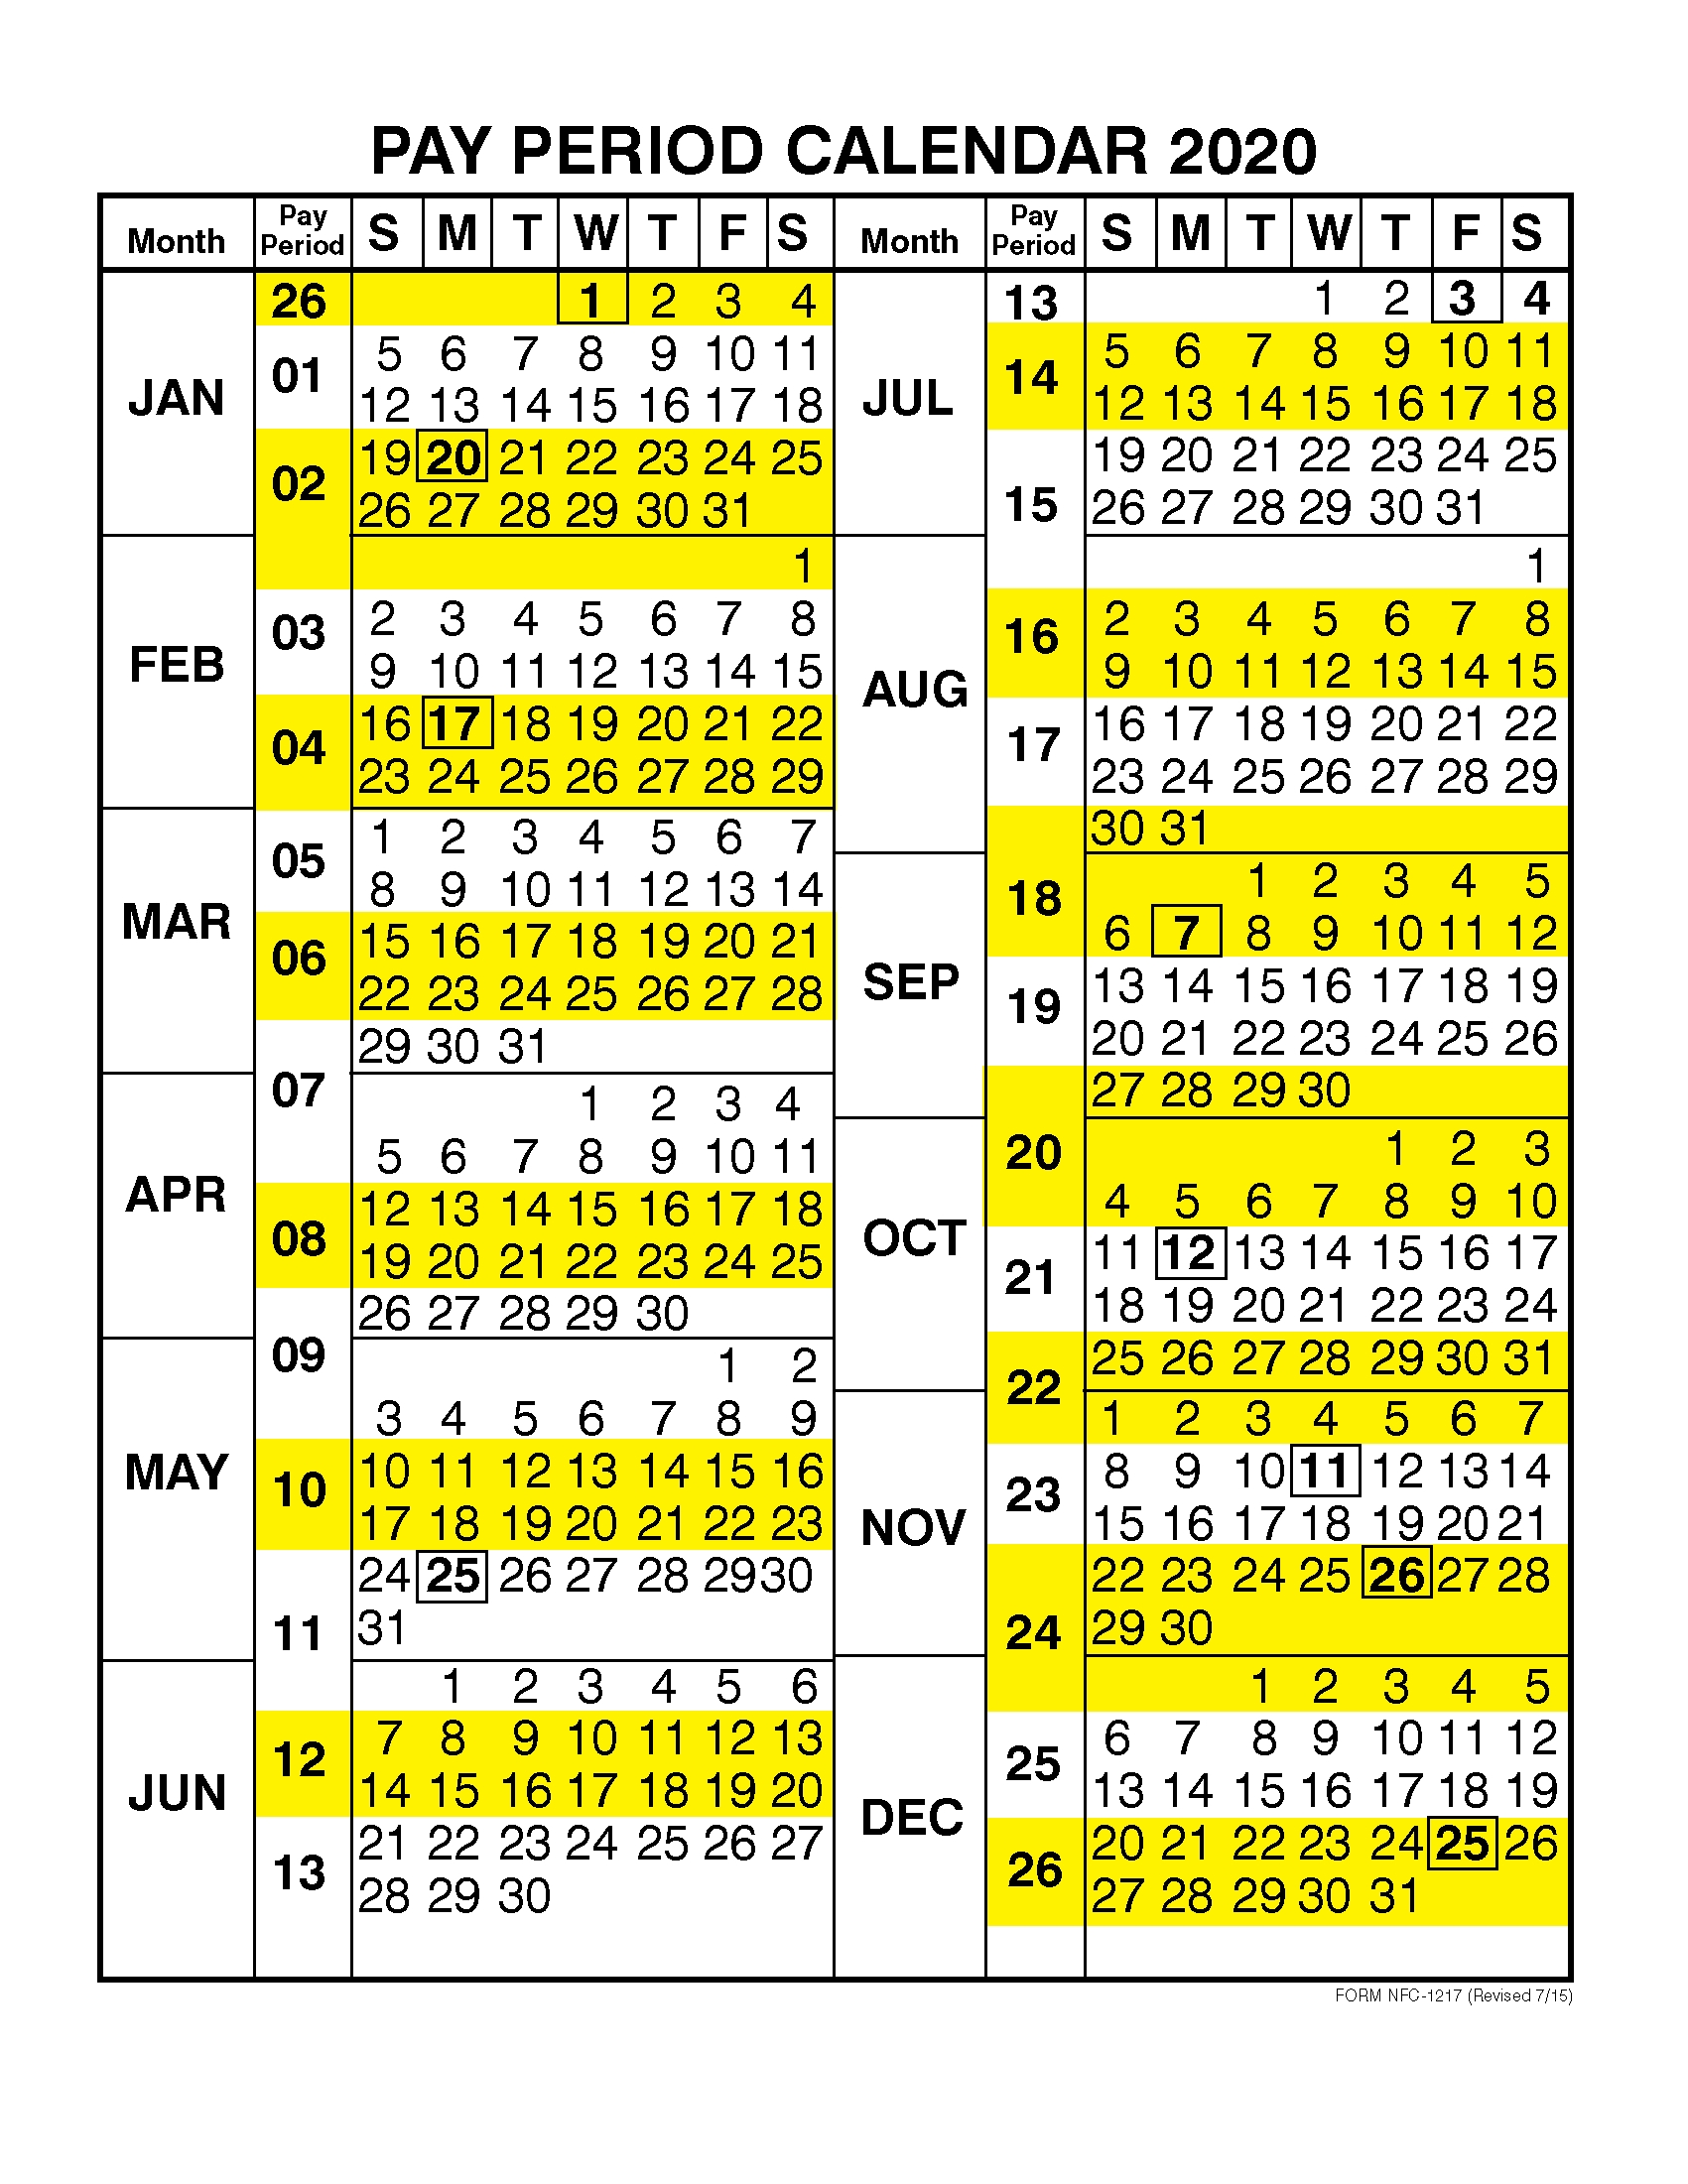 Pay Period Calendar 2020Calendar Year – Free Printable  Federal Payroll Calendar 2020 Opm